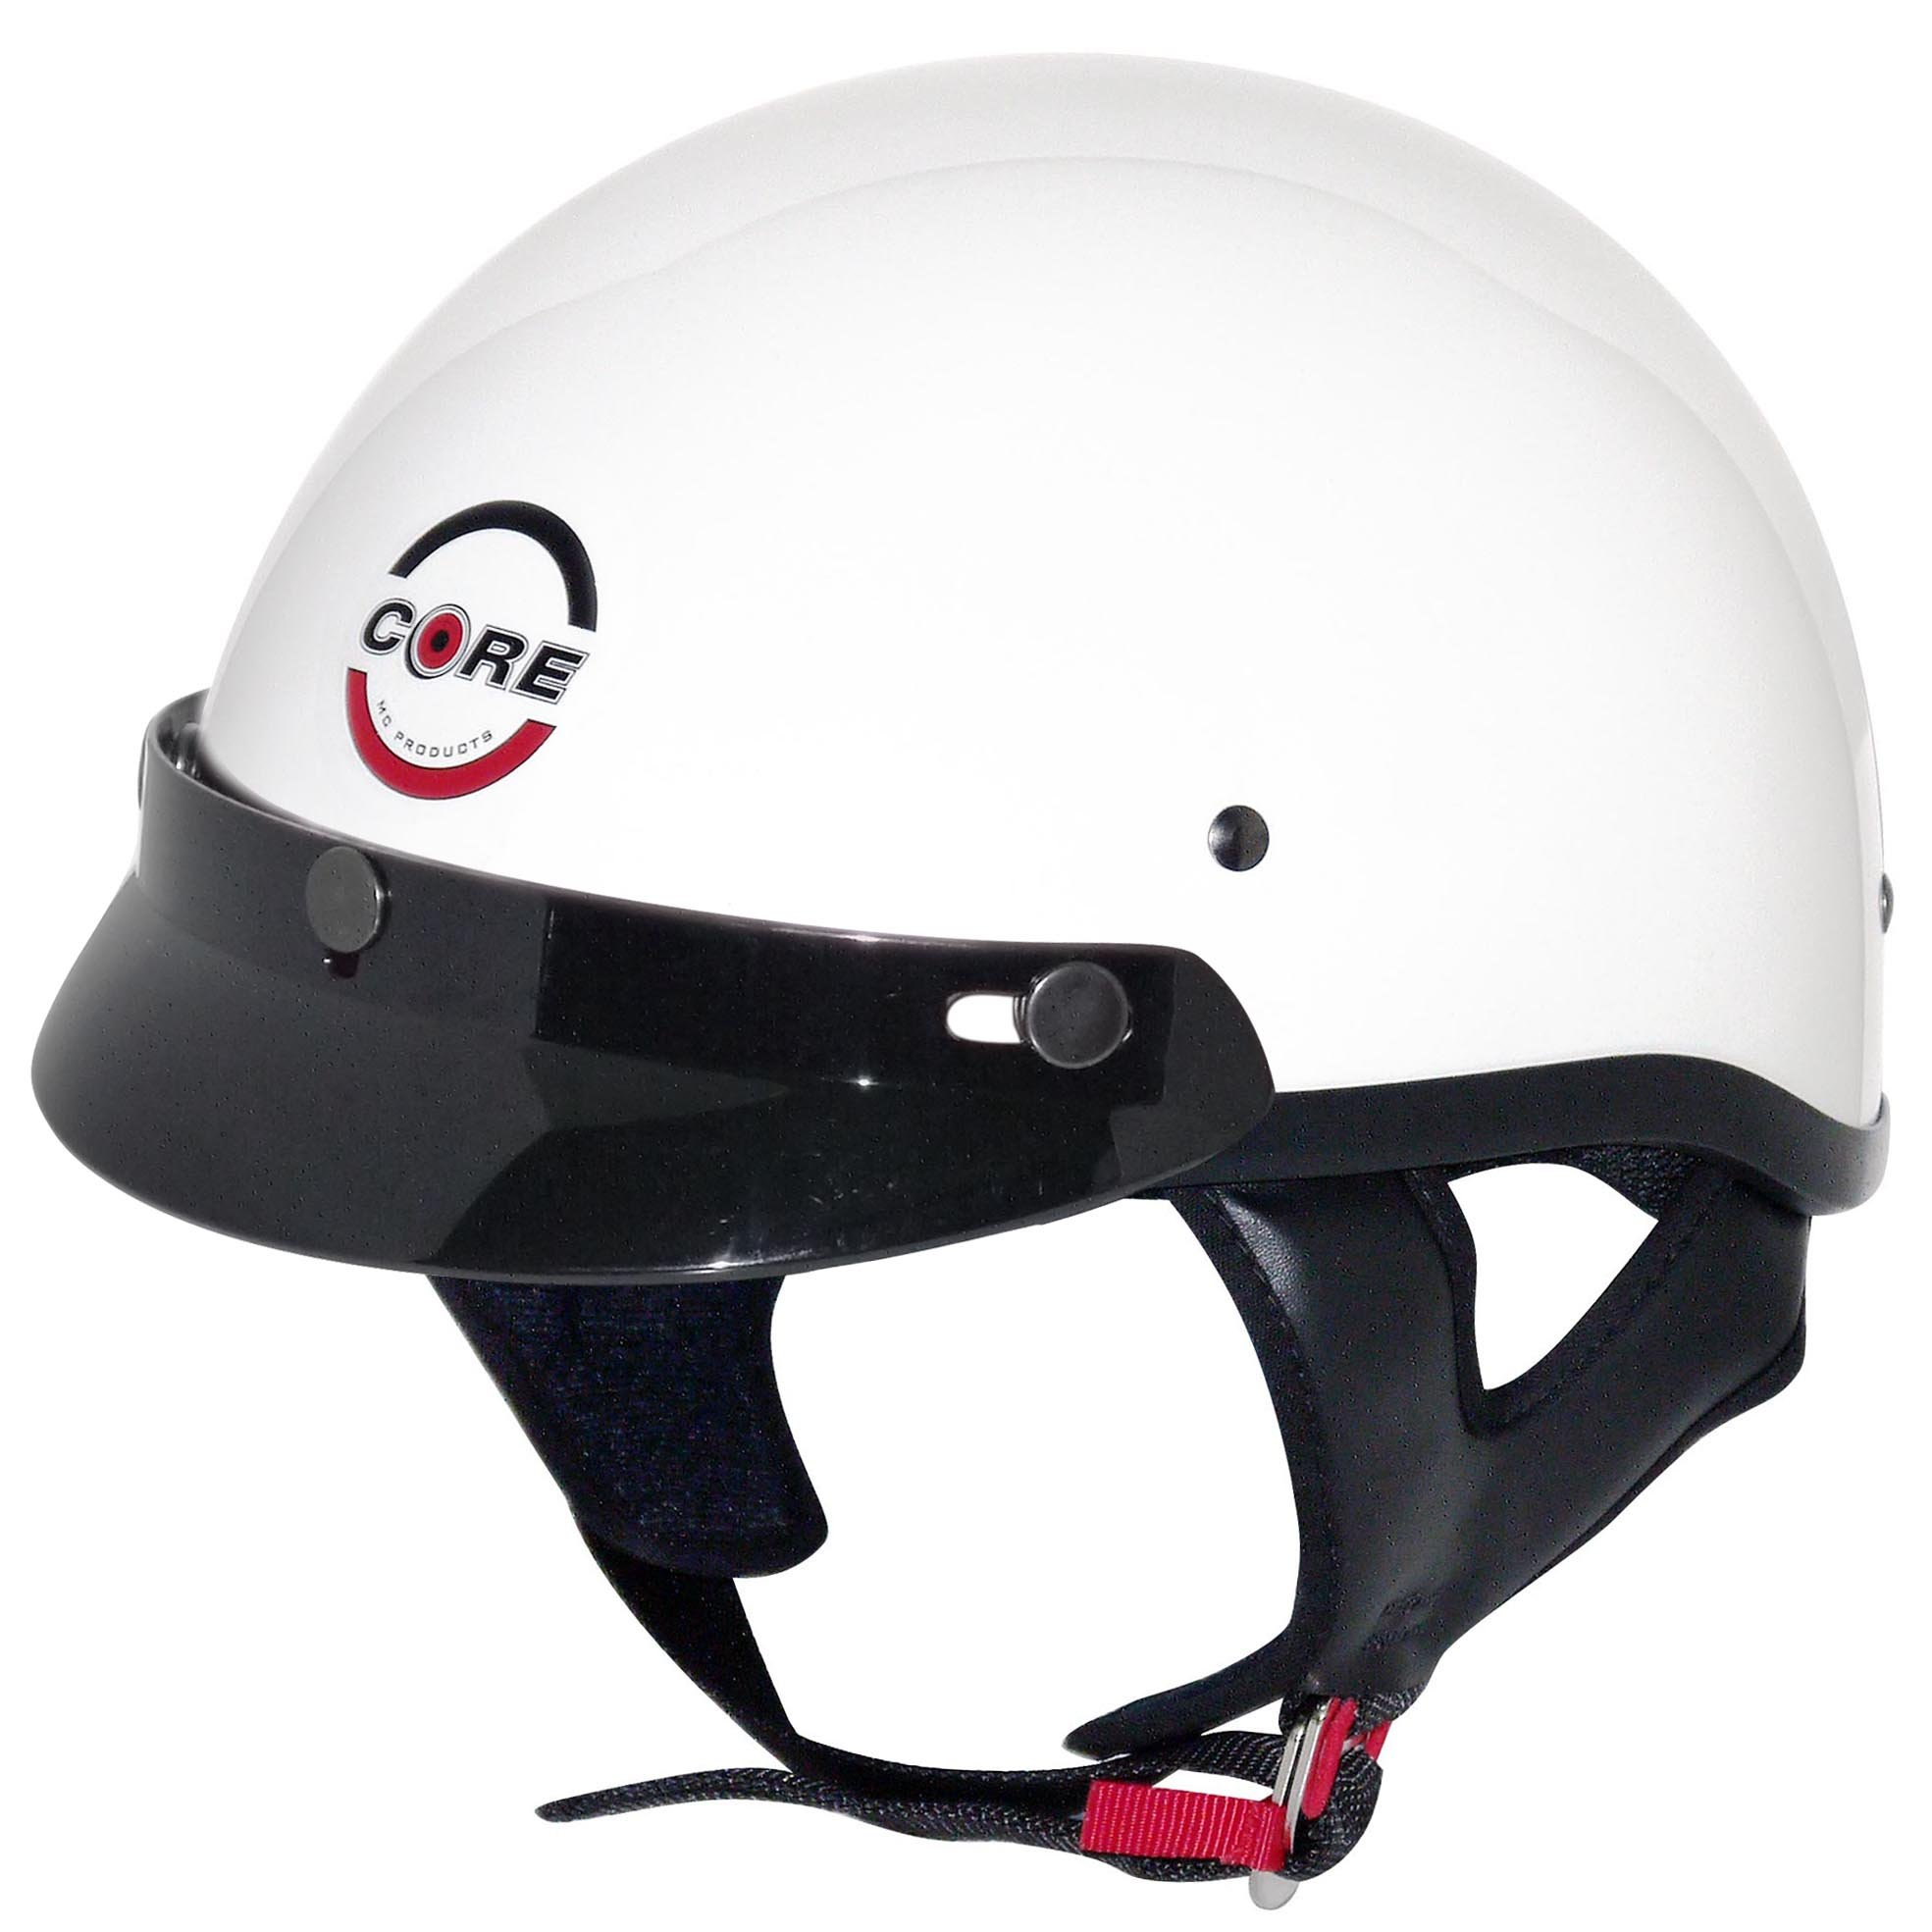 Core Cruiser Shorty Half Helmet (White, XX-Large)